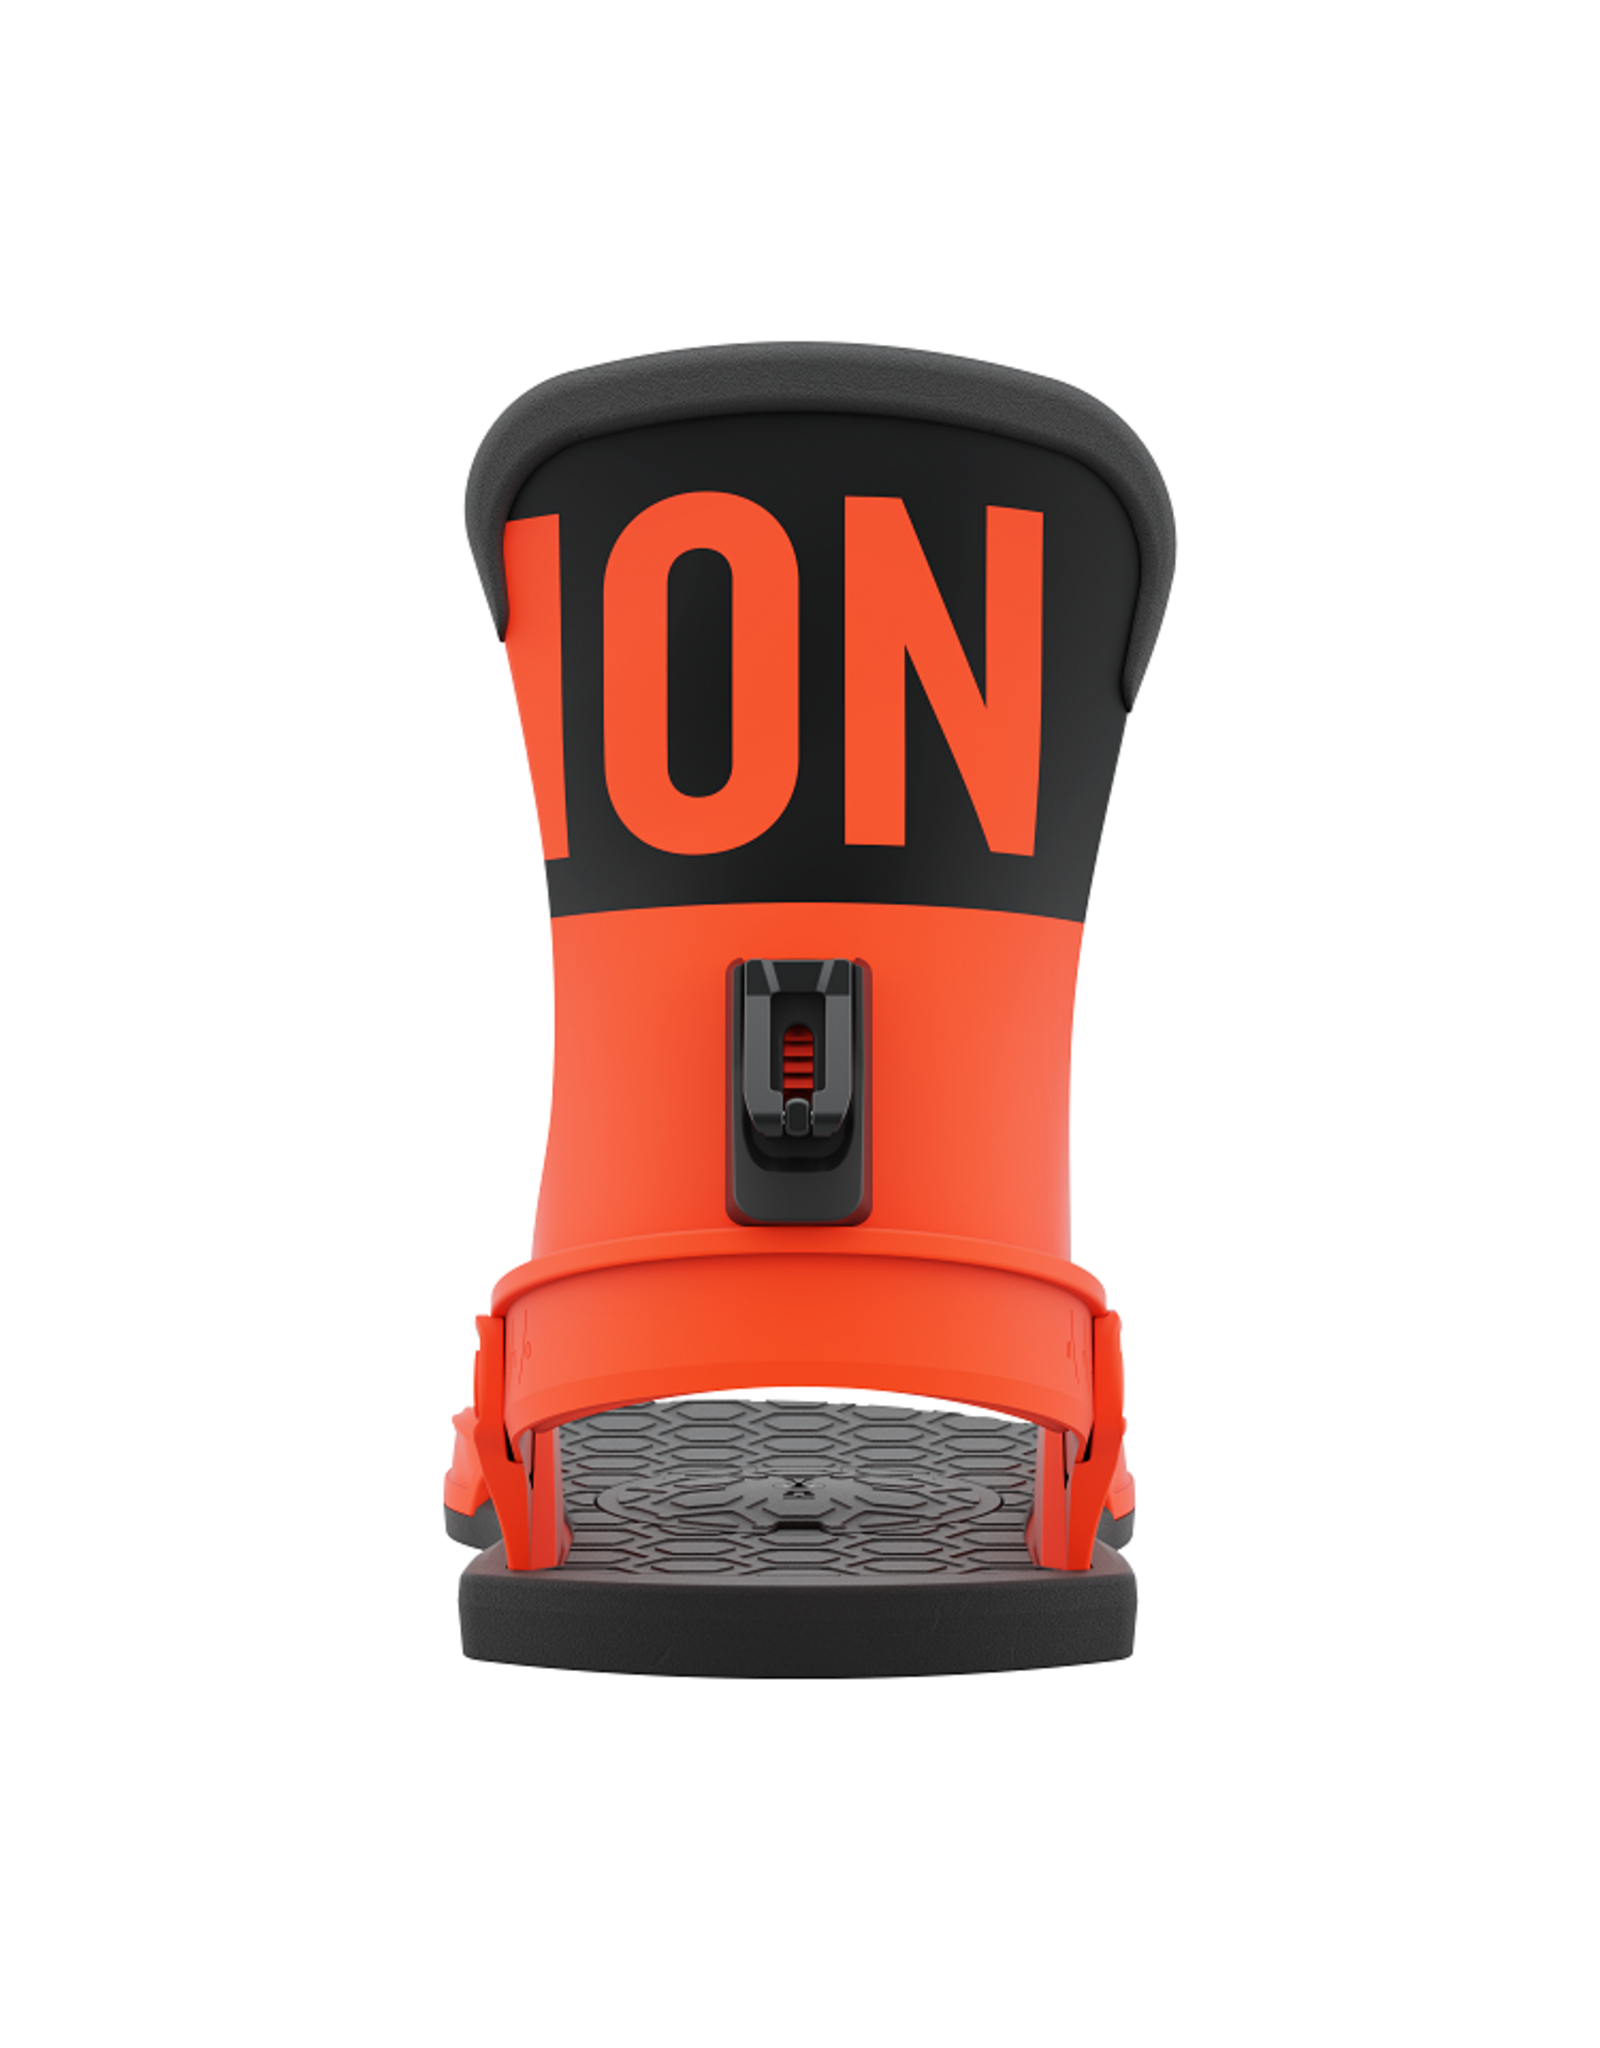 Union Contact Pro - Orange